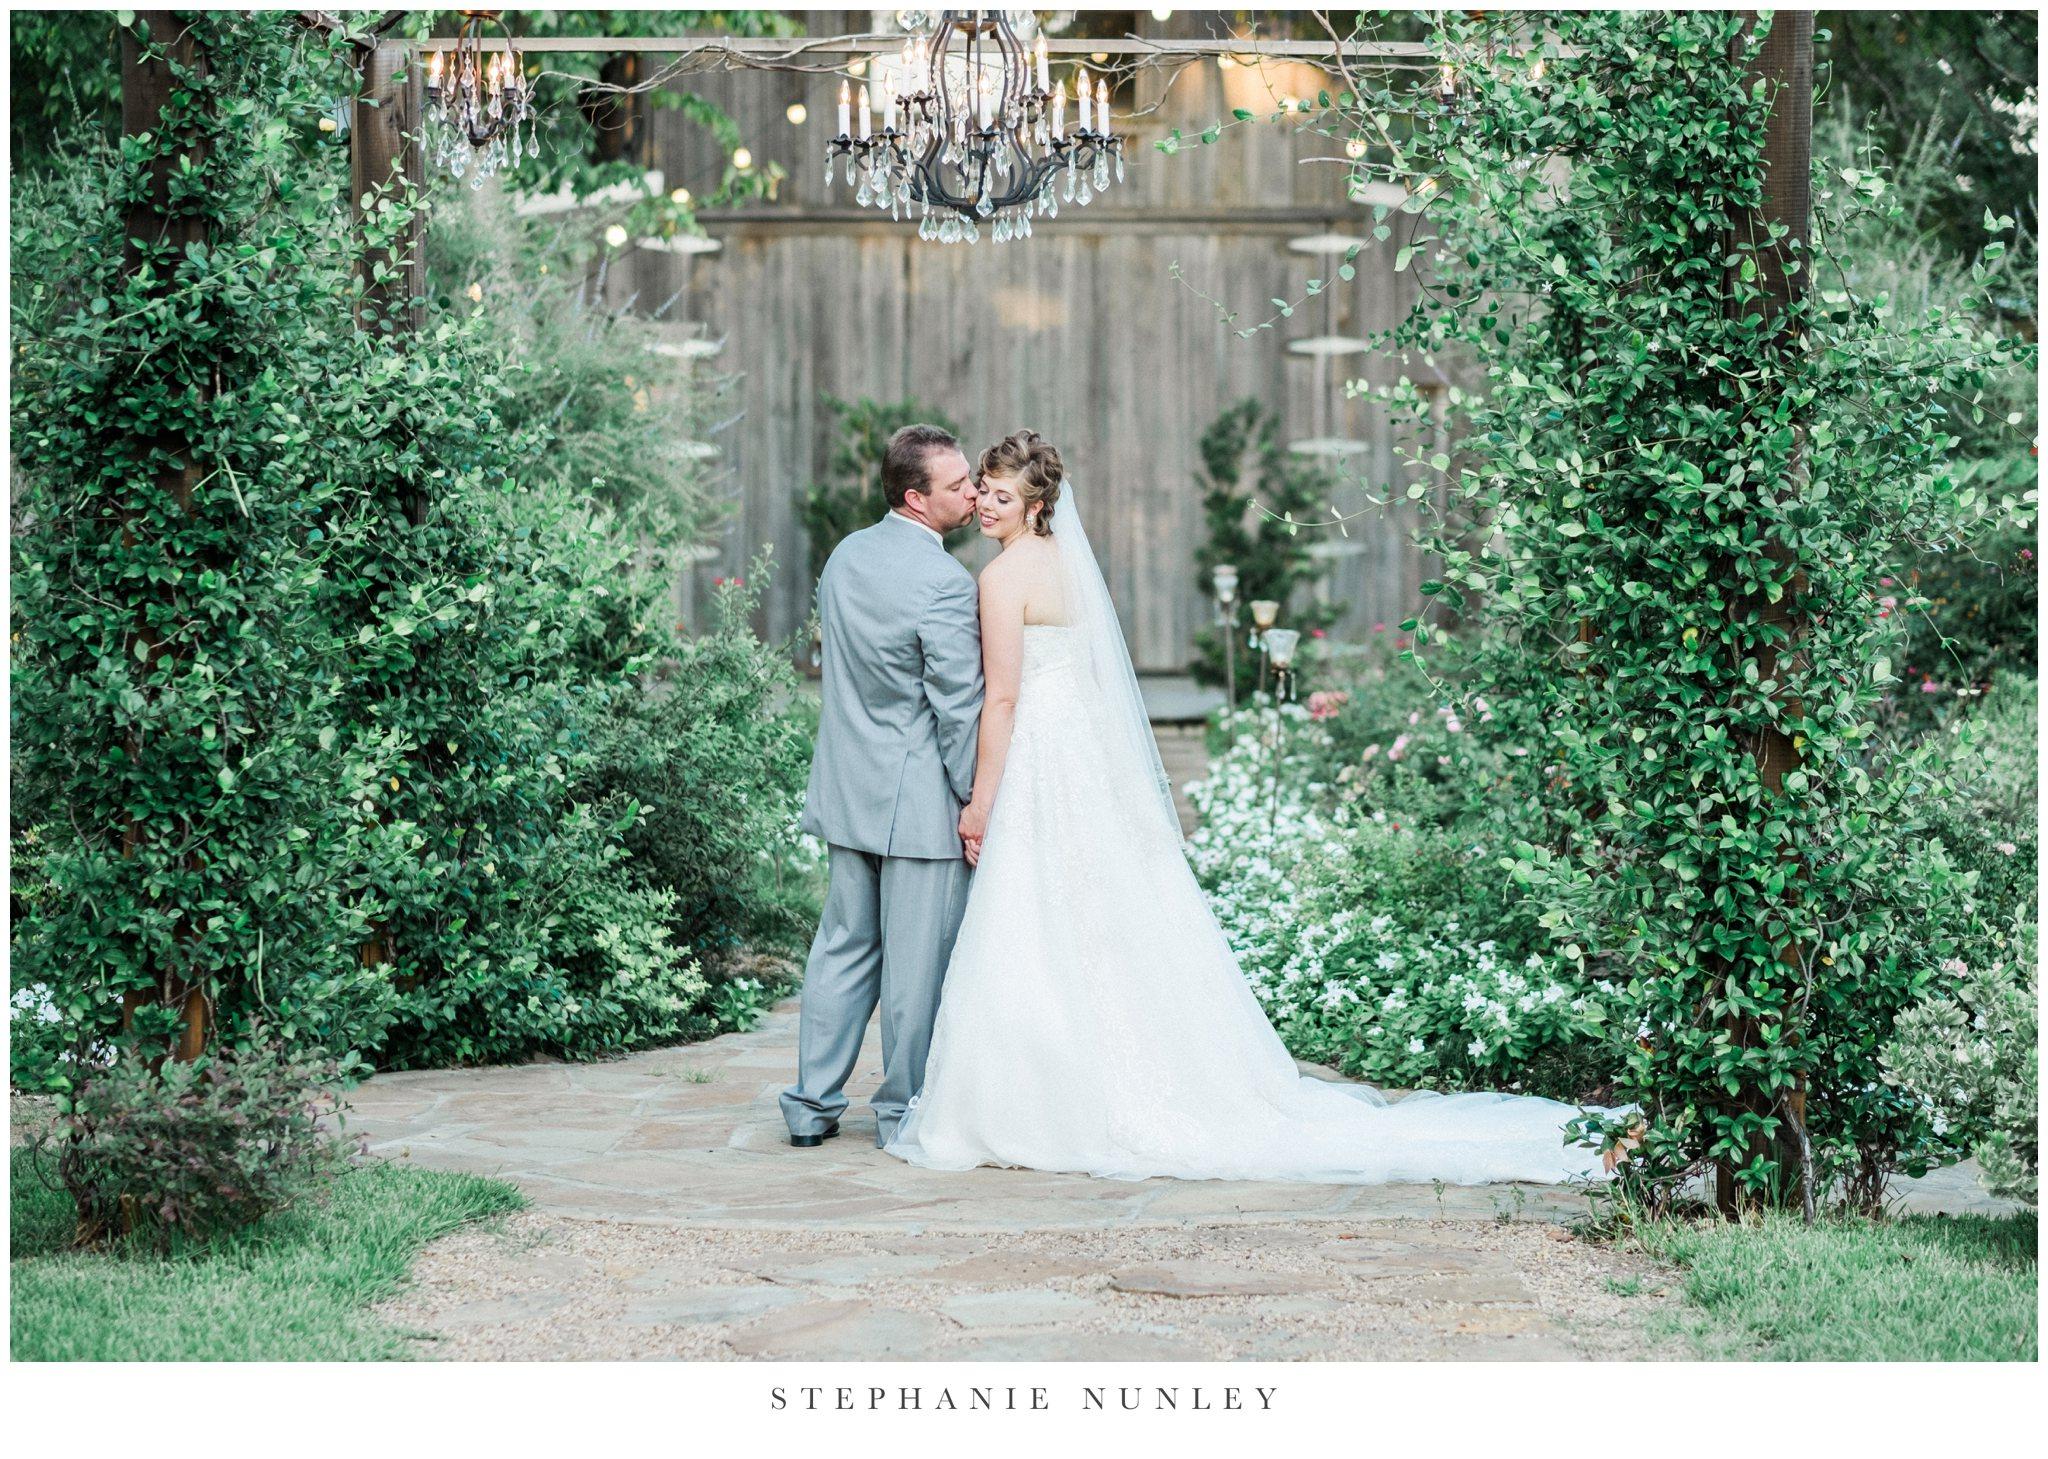 southern-classy-outdoor-barn-wedding-photos-0096.jpg